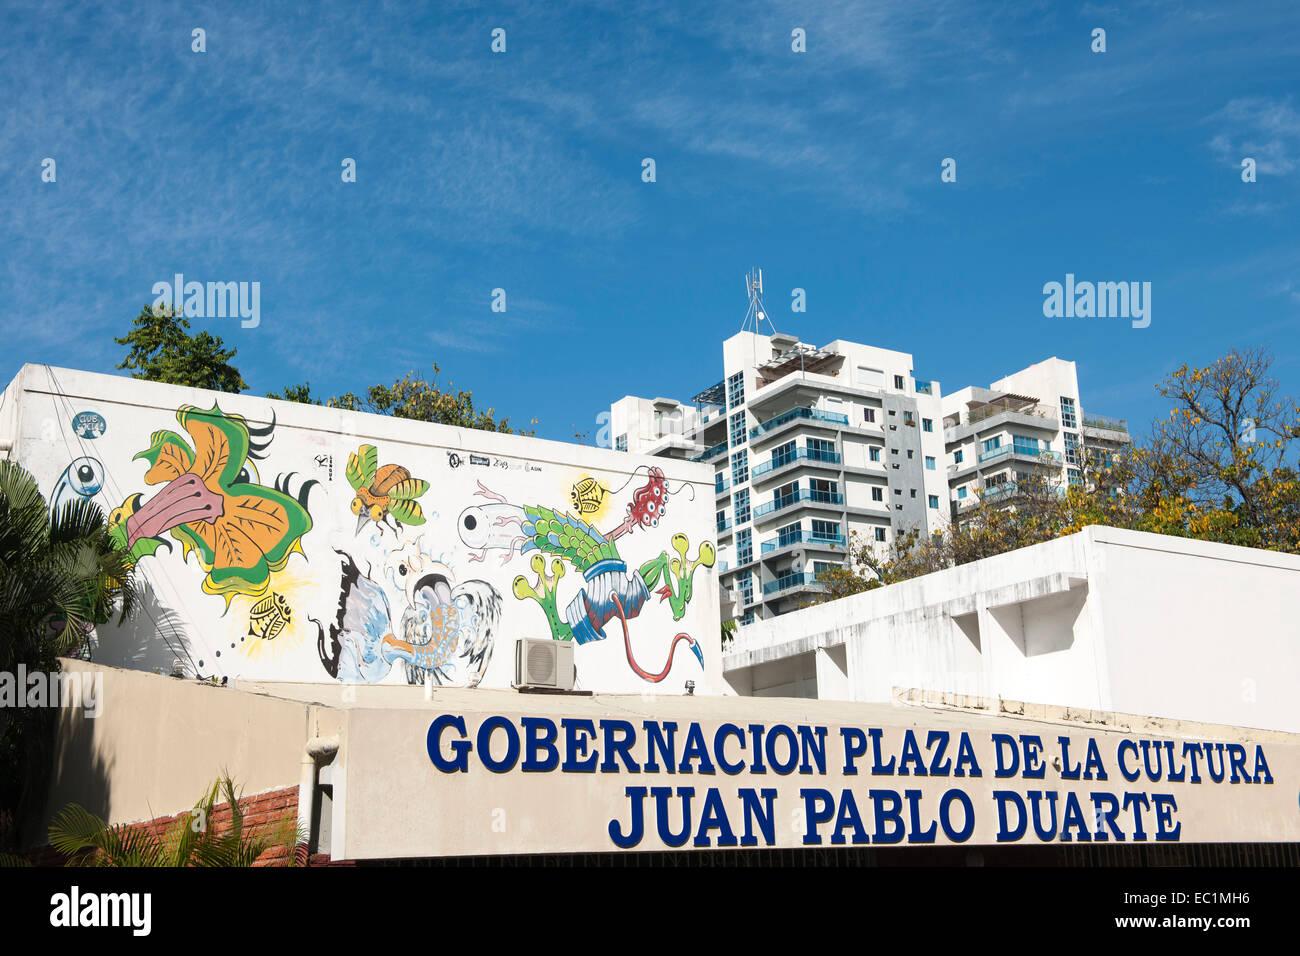 Dominikanische Republik, Santo Domingo, Parque de la Cultura, - Stock Image